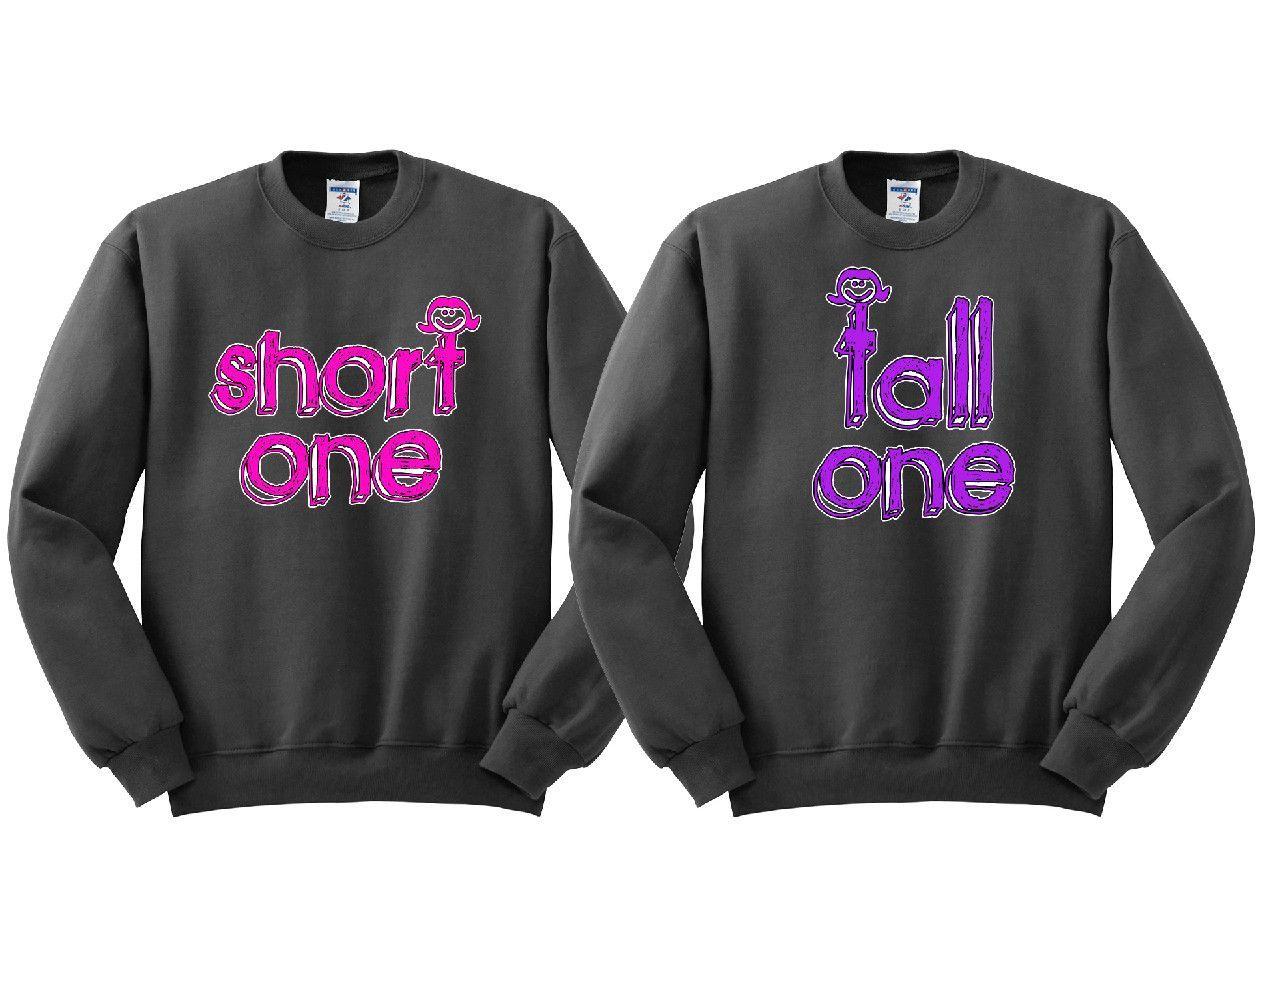 Short One Tall One Girl BFFS Sweatshirts